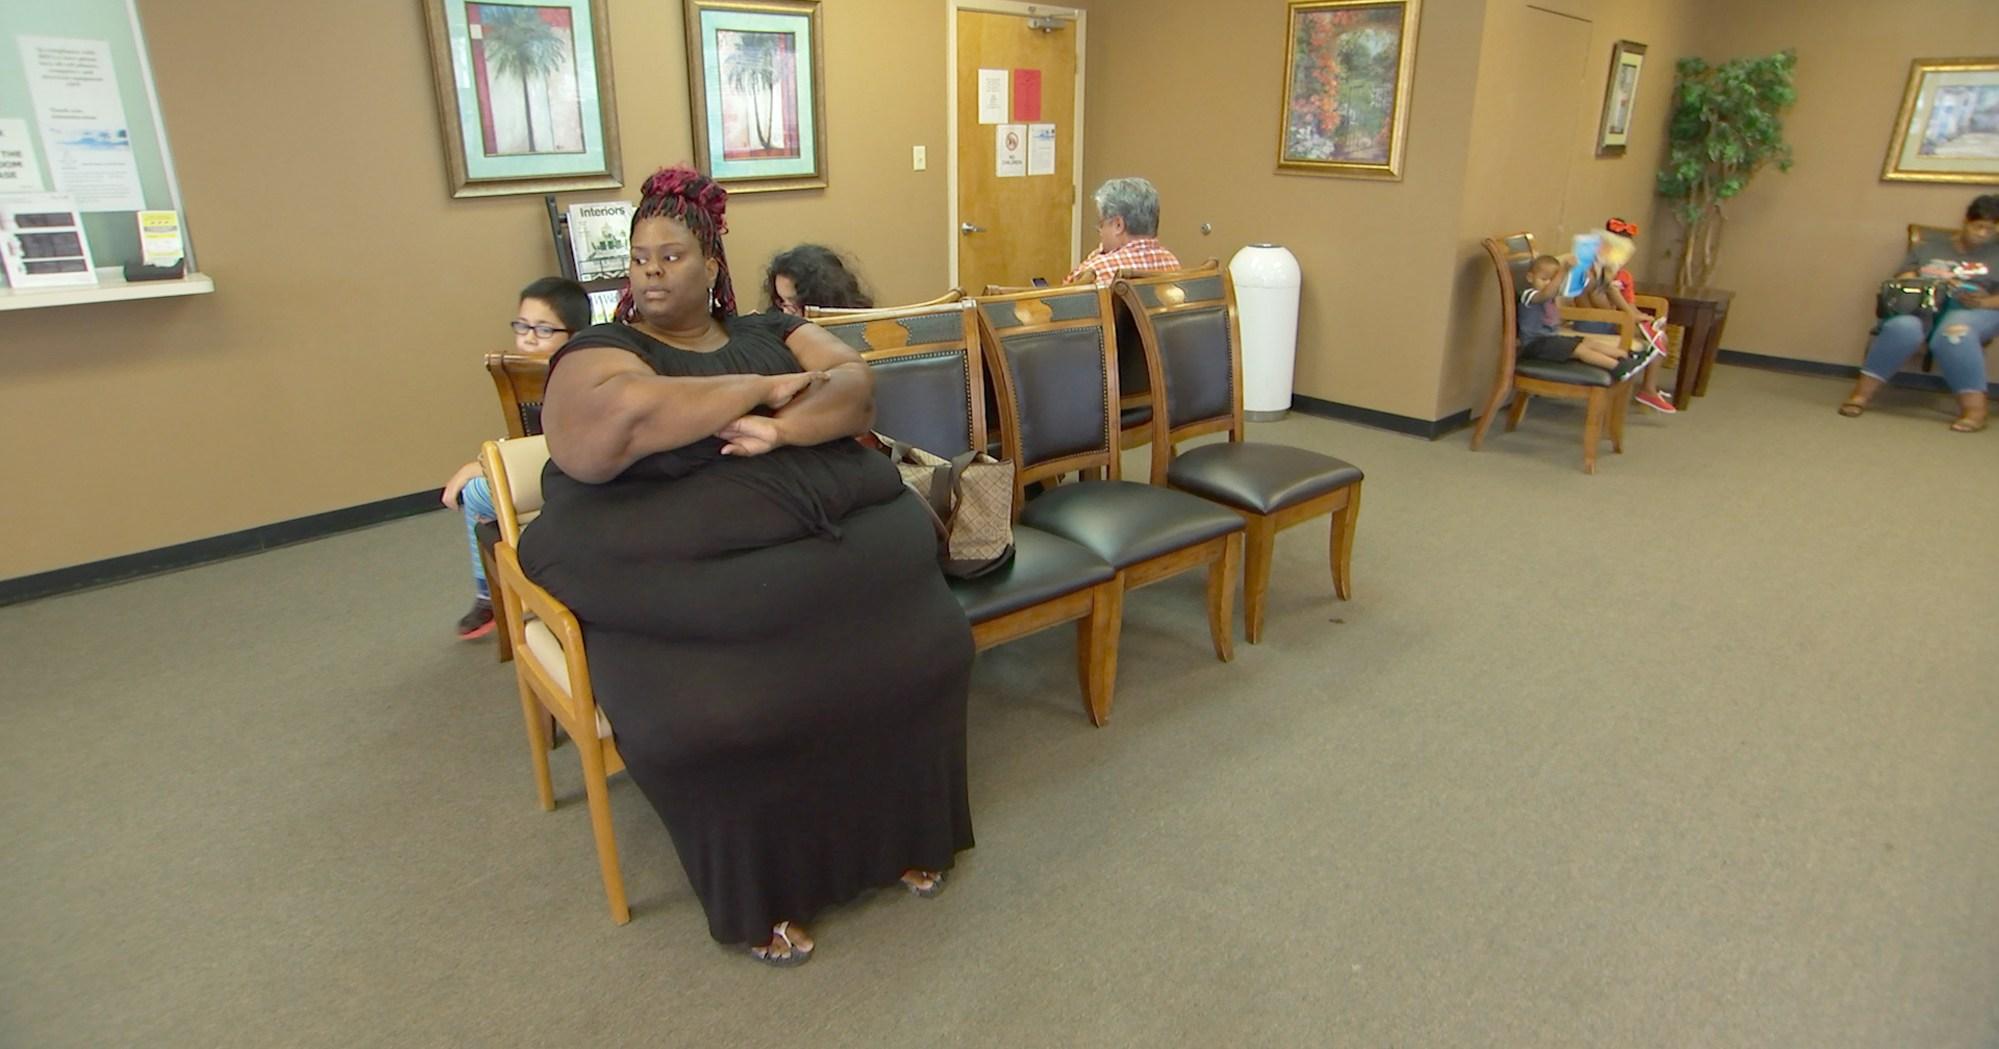 'My 600-lb Life' Recap: Patient Loses 156 Pounds But Calls the Process 'Bulls–t,' Refuses Therapy